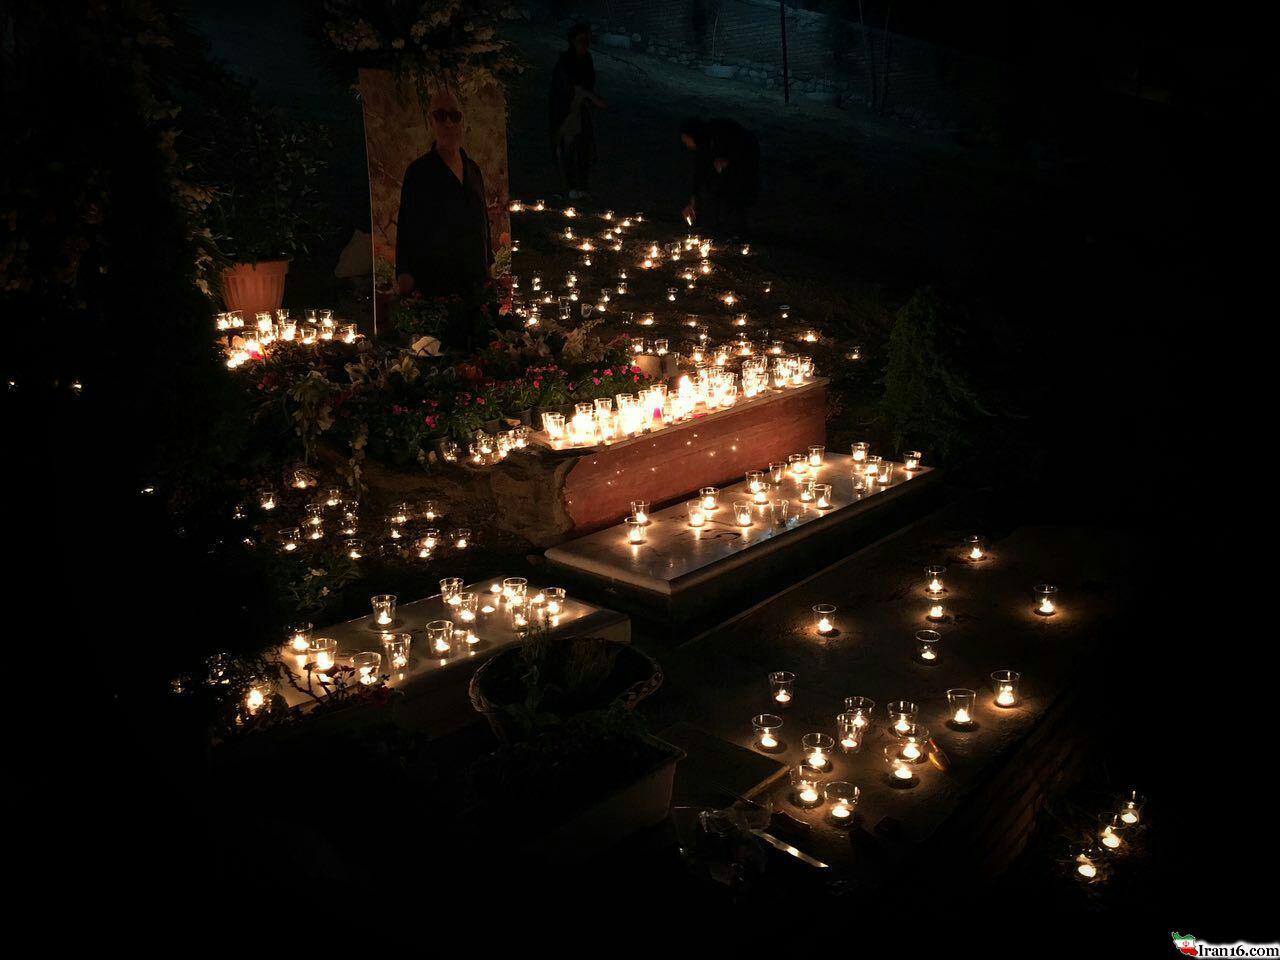 شب اول قبر کیارستمی اینگونه رقم خورد / عکس